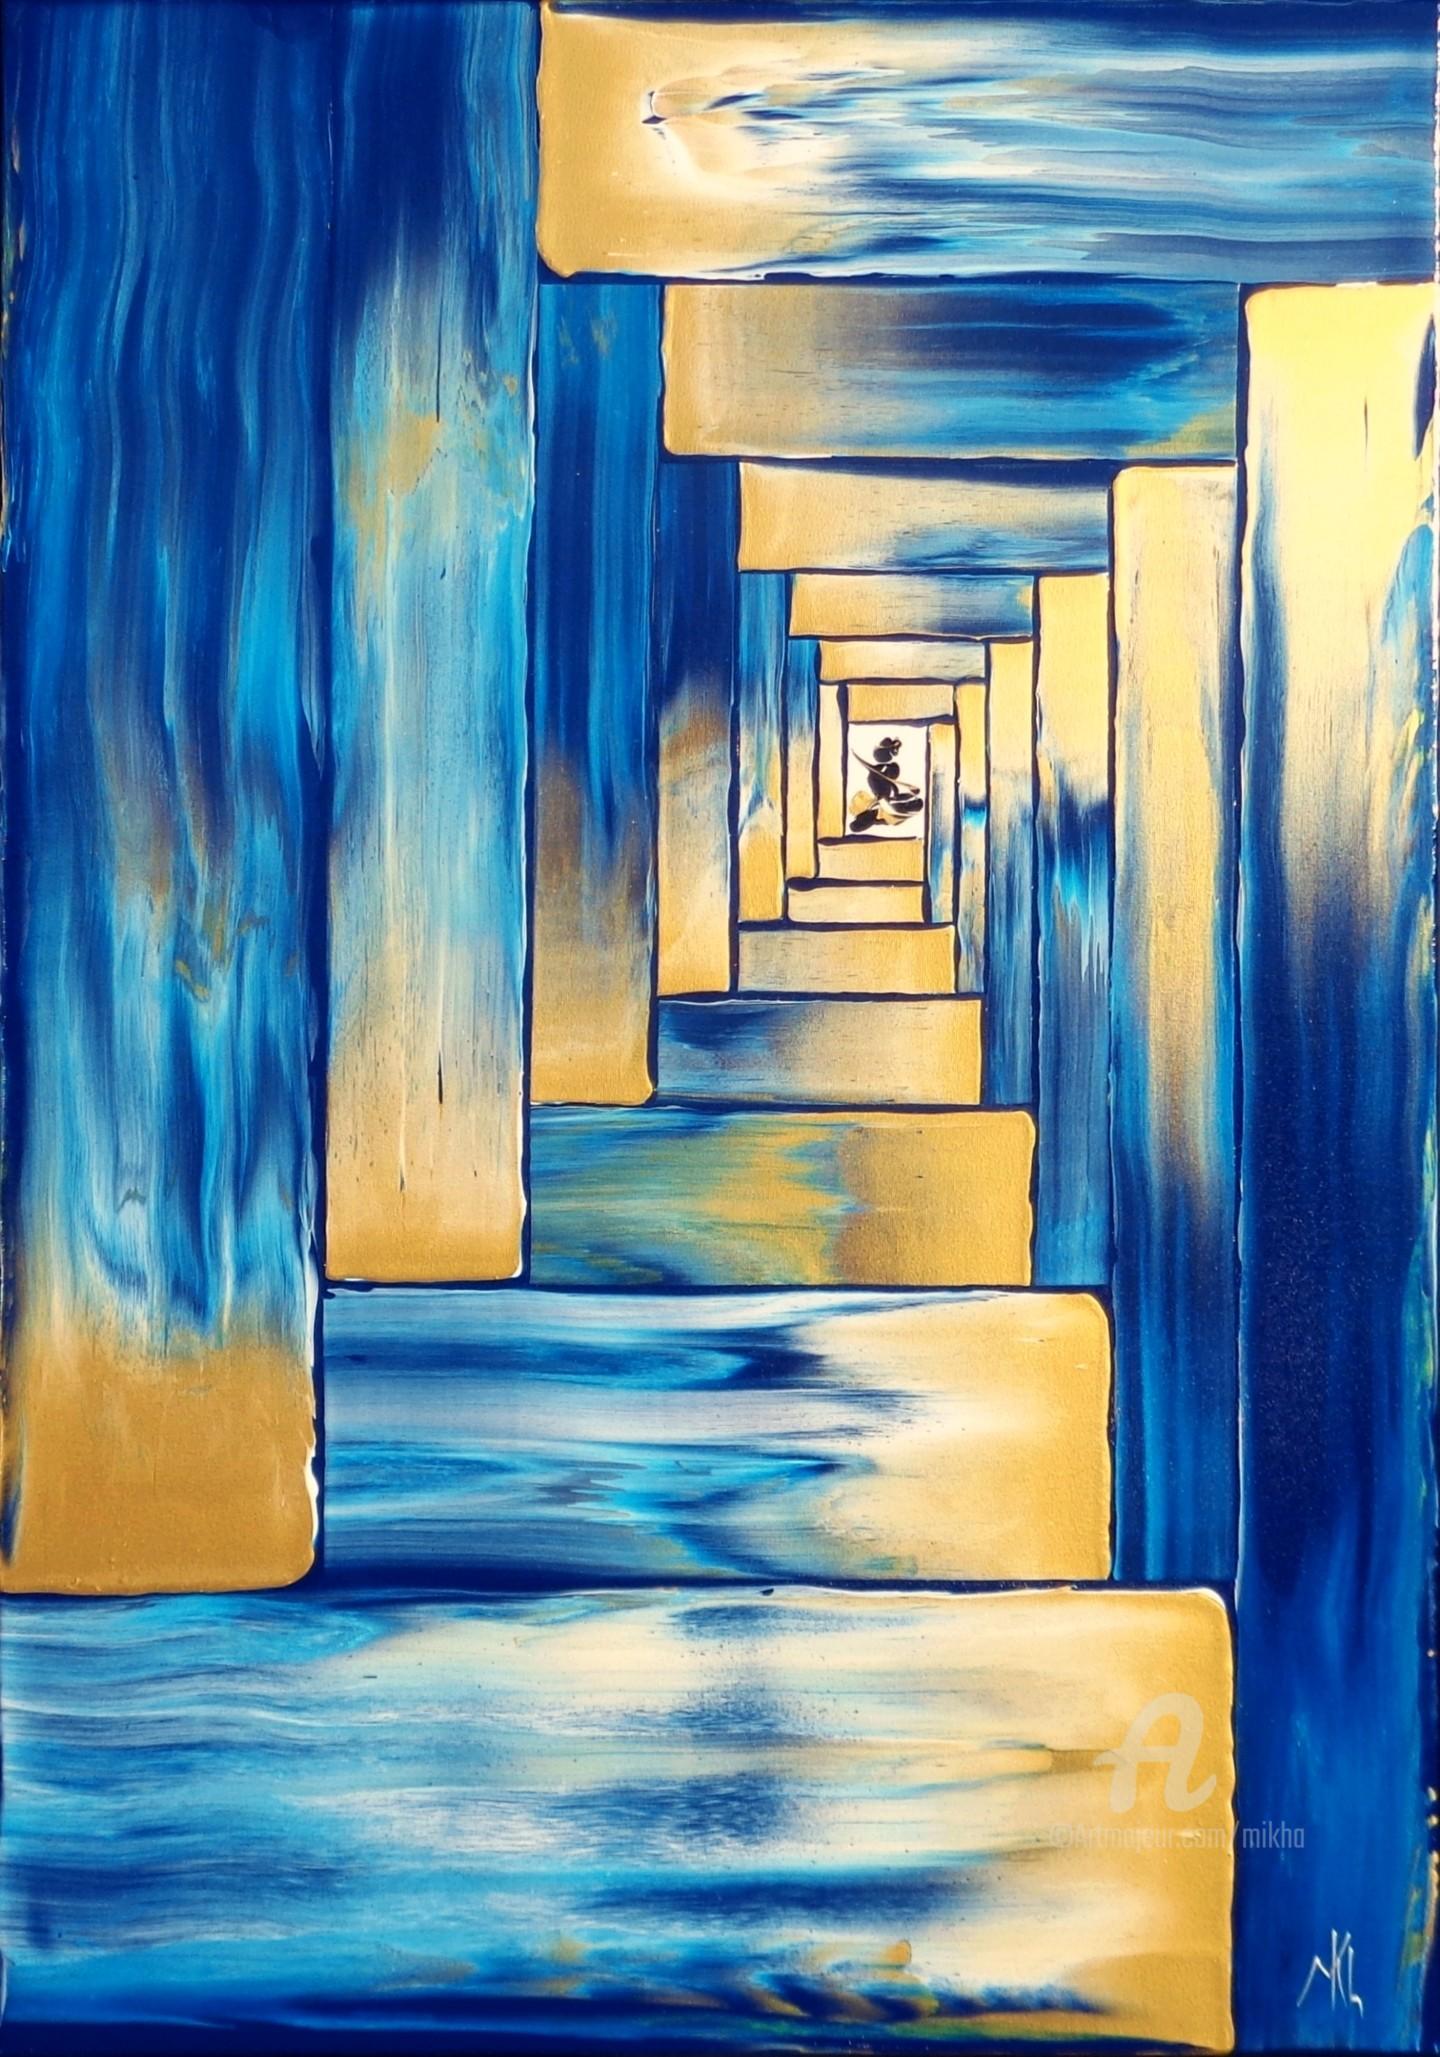 Mikha - Porte dorée (stairway to...)